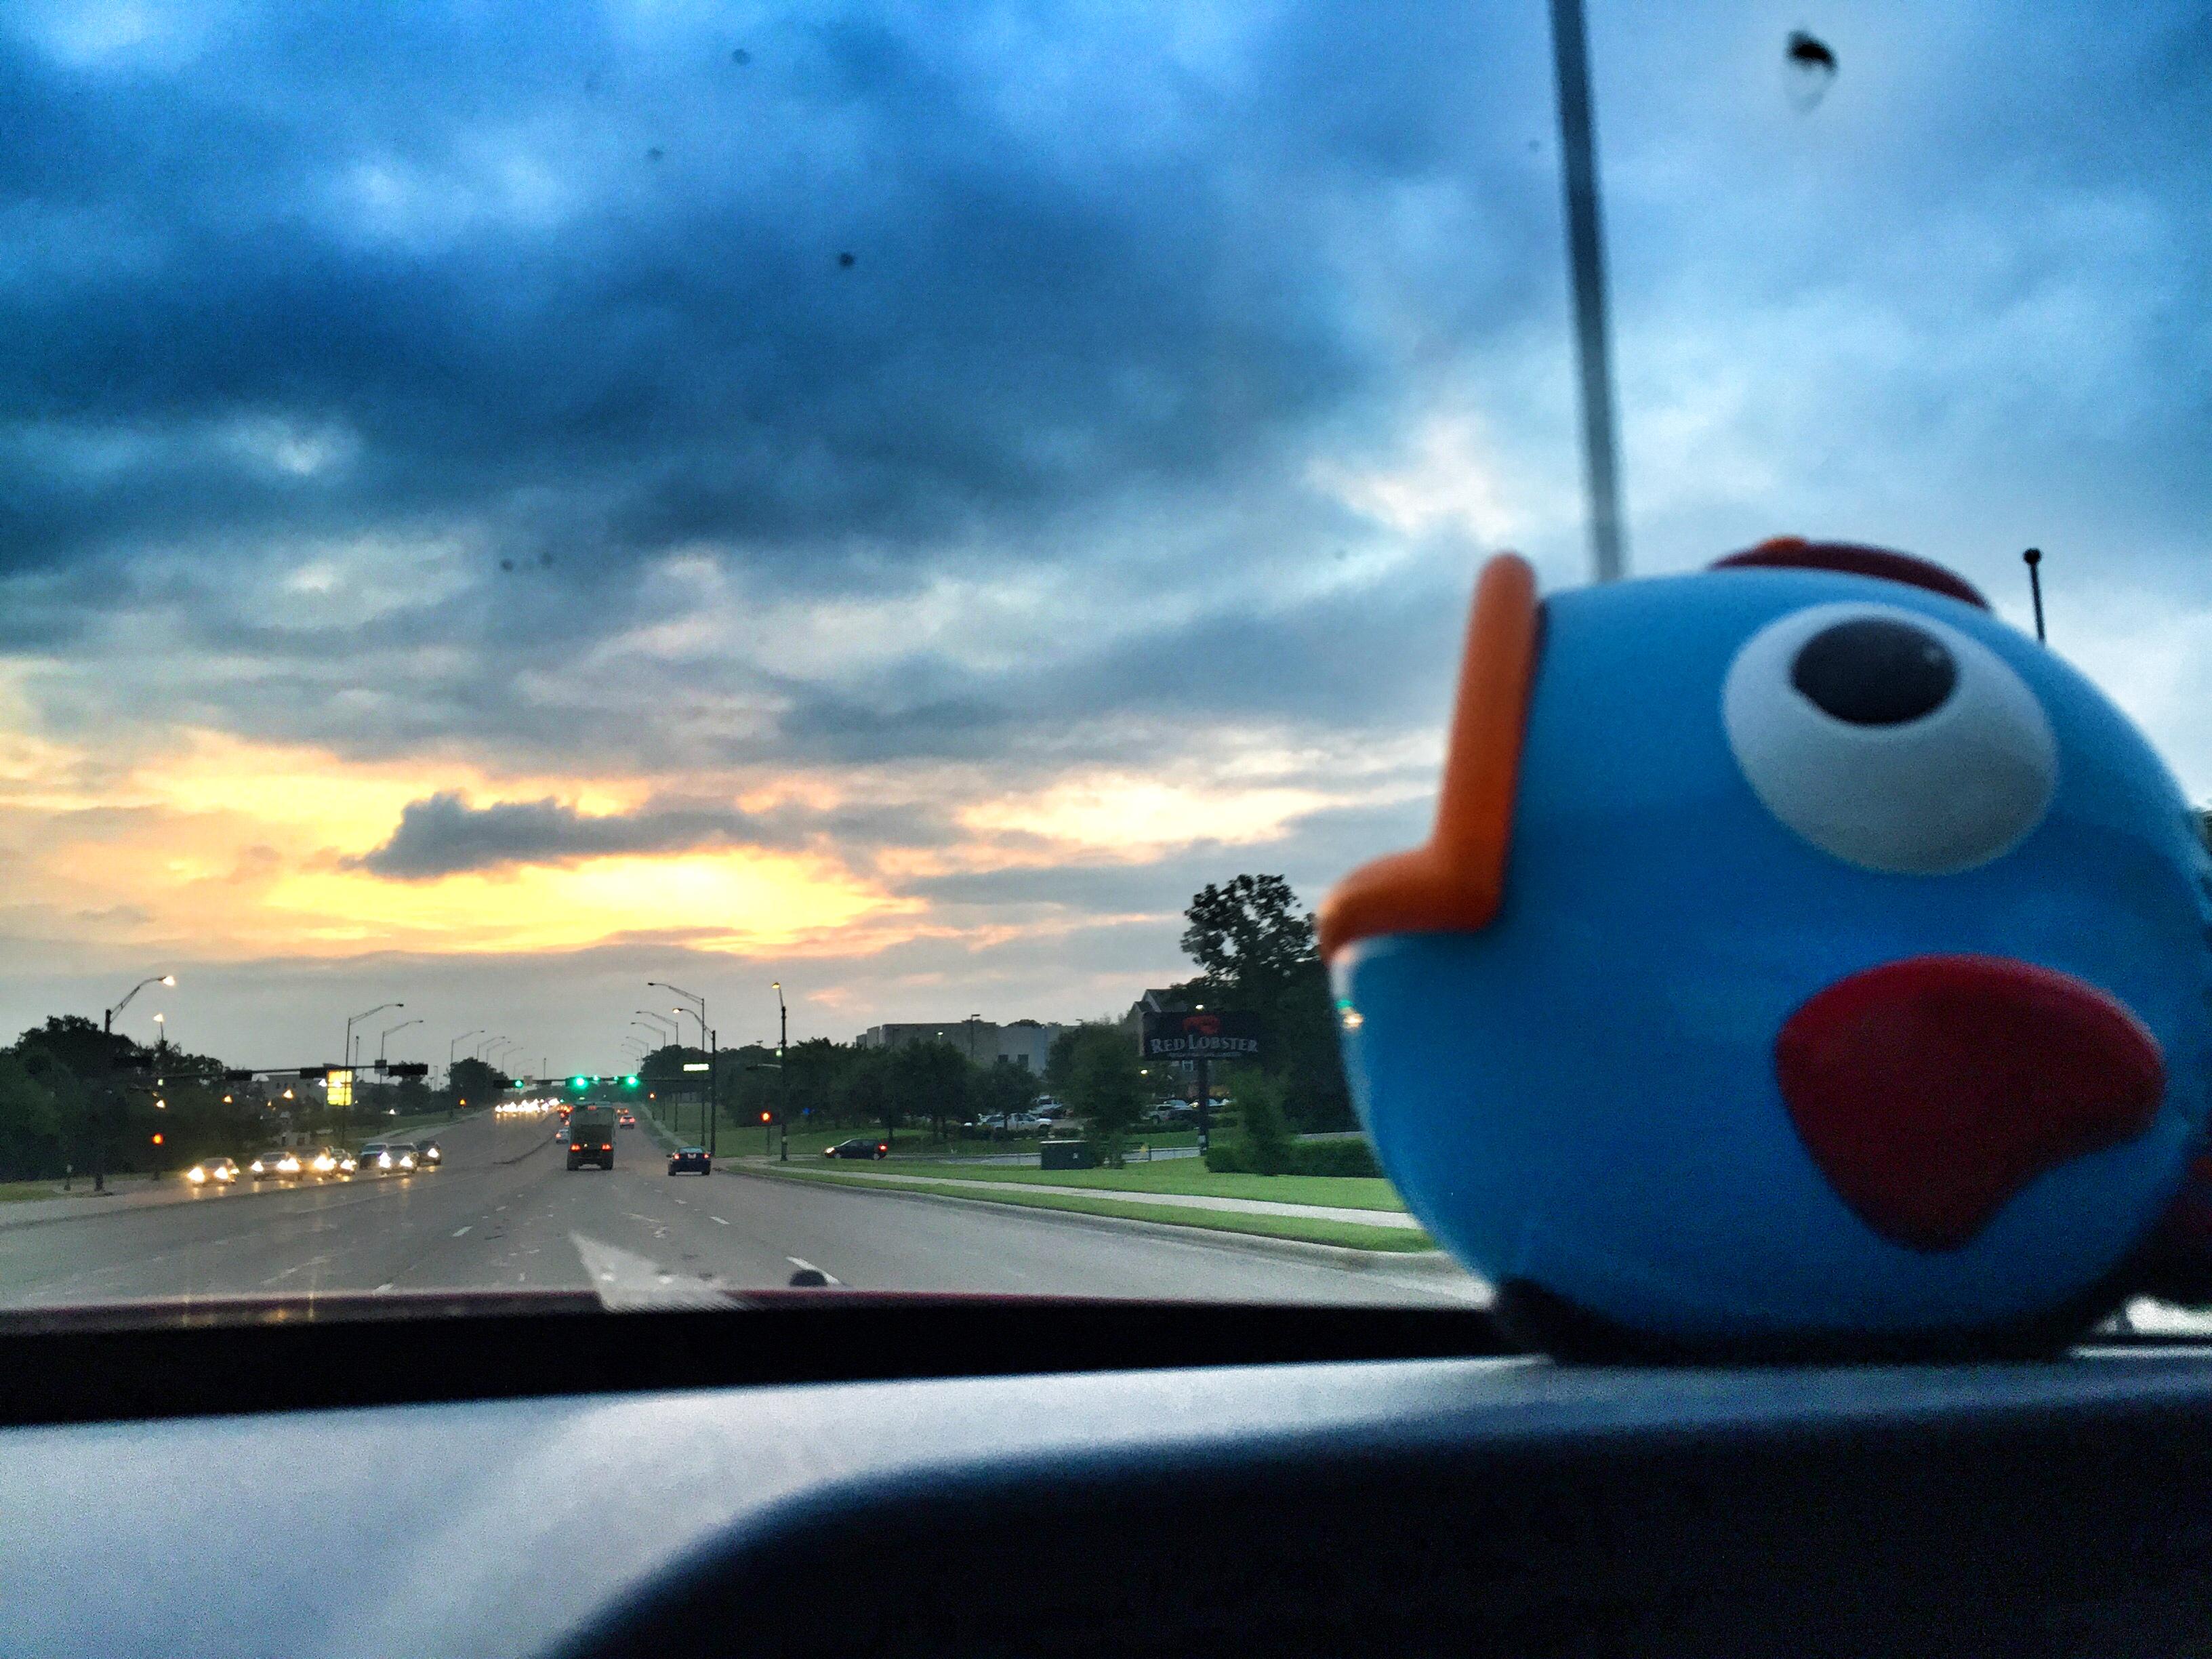 Whammy Jr. on the road - @Statboy203